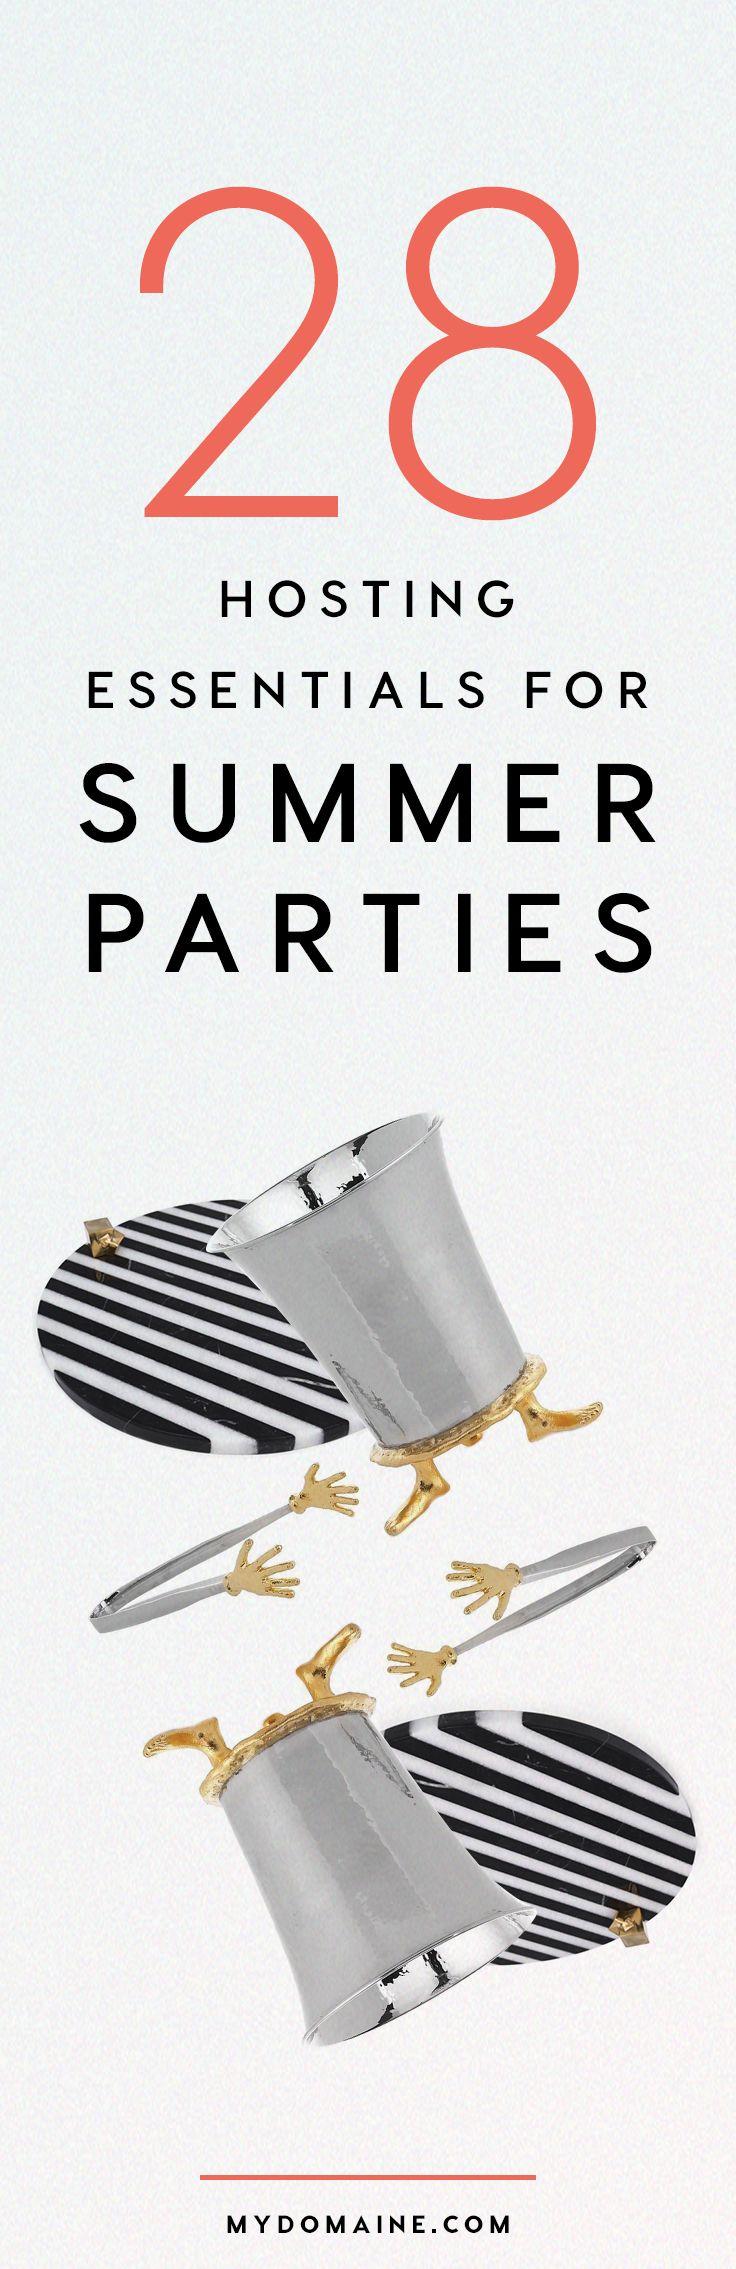 Best 20+ Tabletop accessories ideas on Pinterest | Dinnerware ...